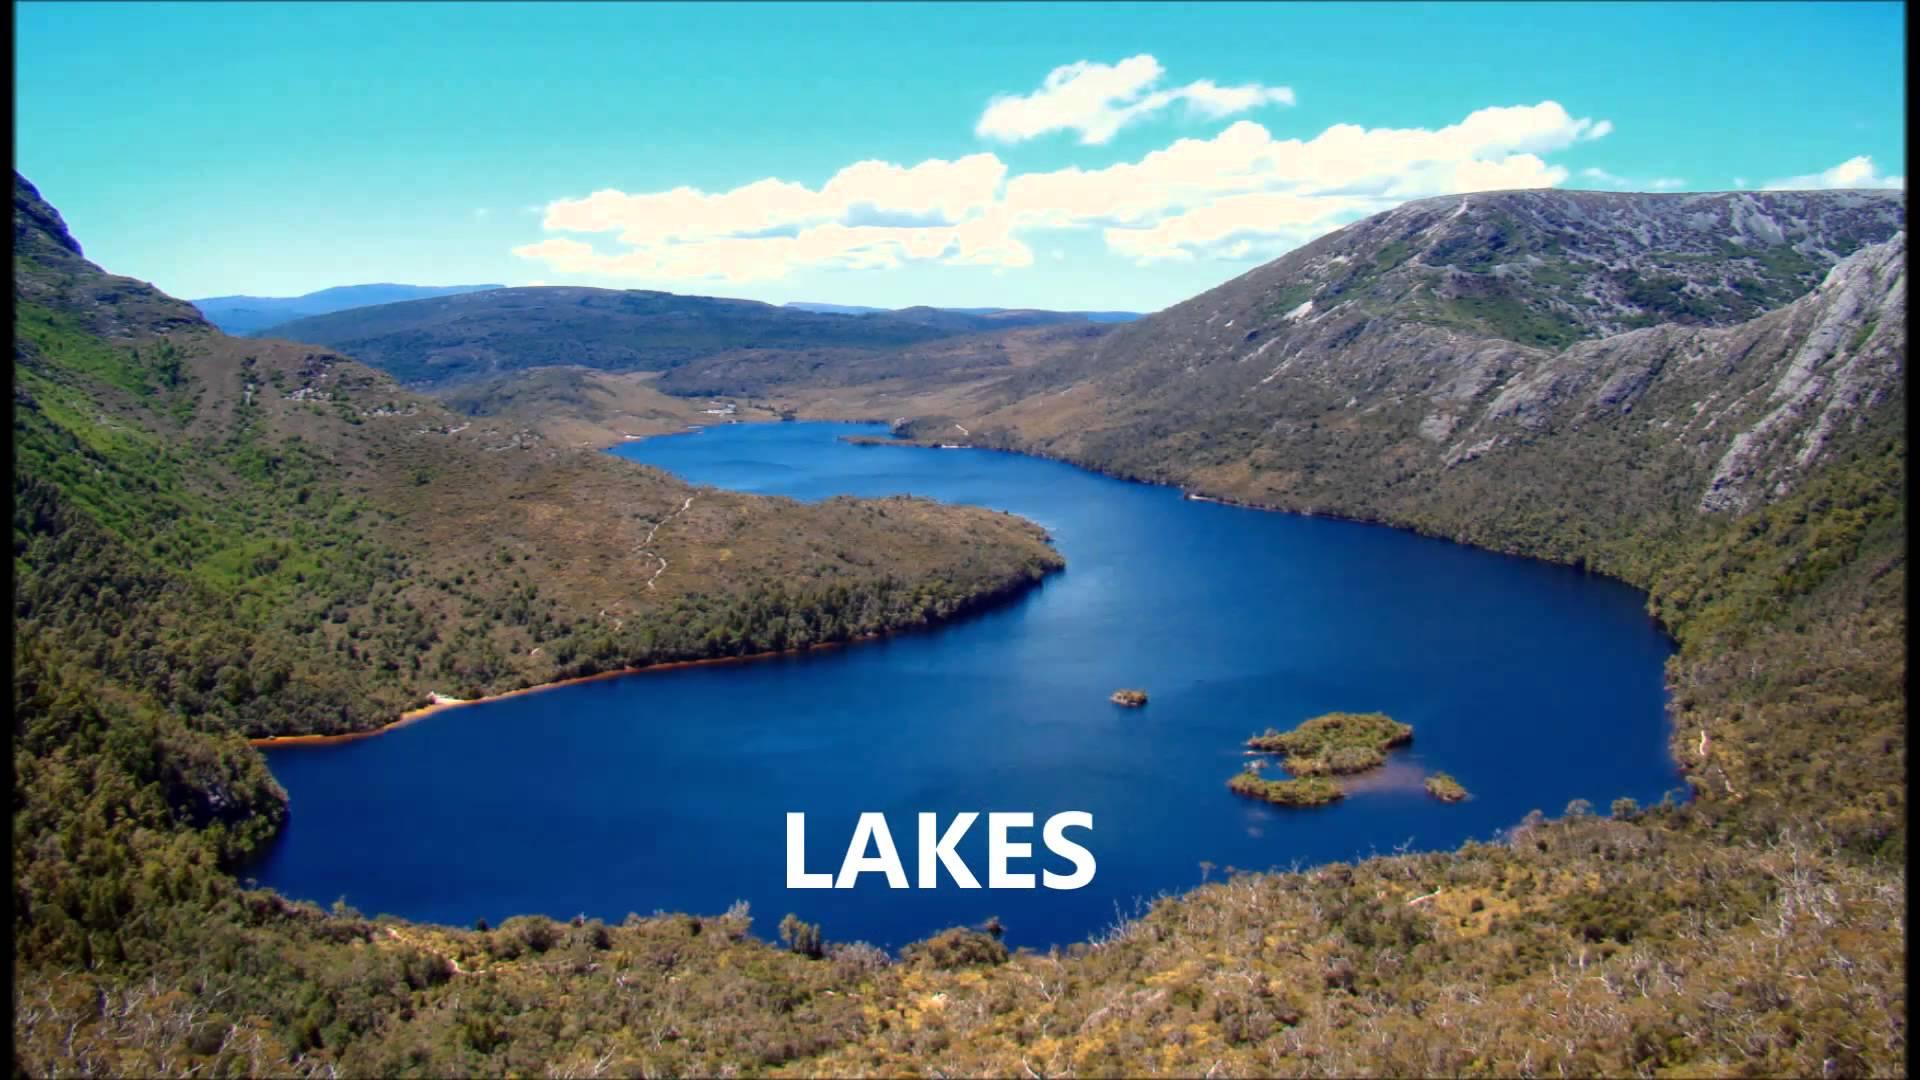 Lakes Grade 4 Uoi